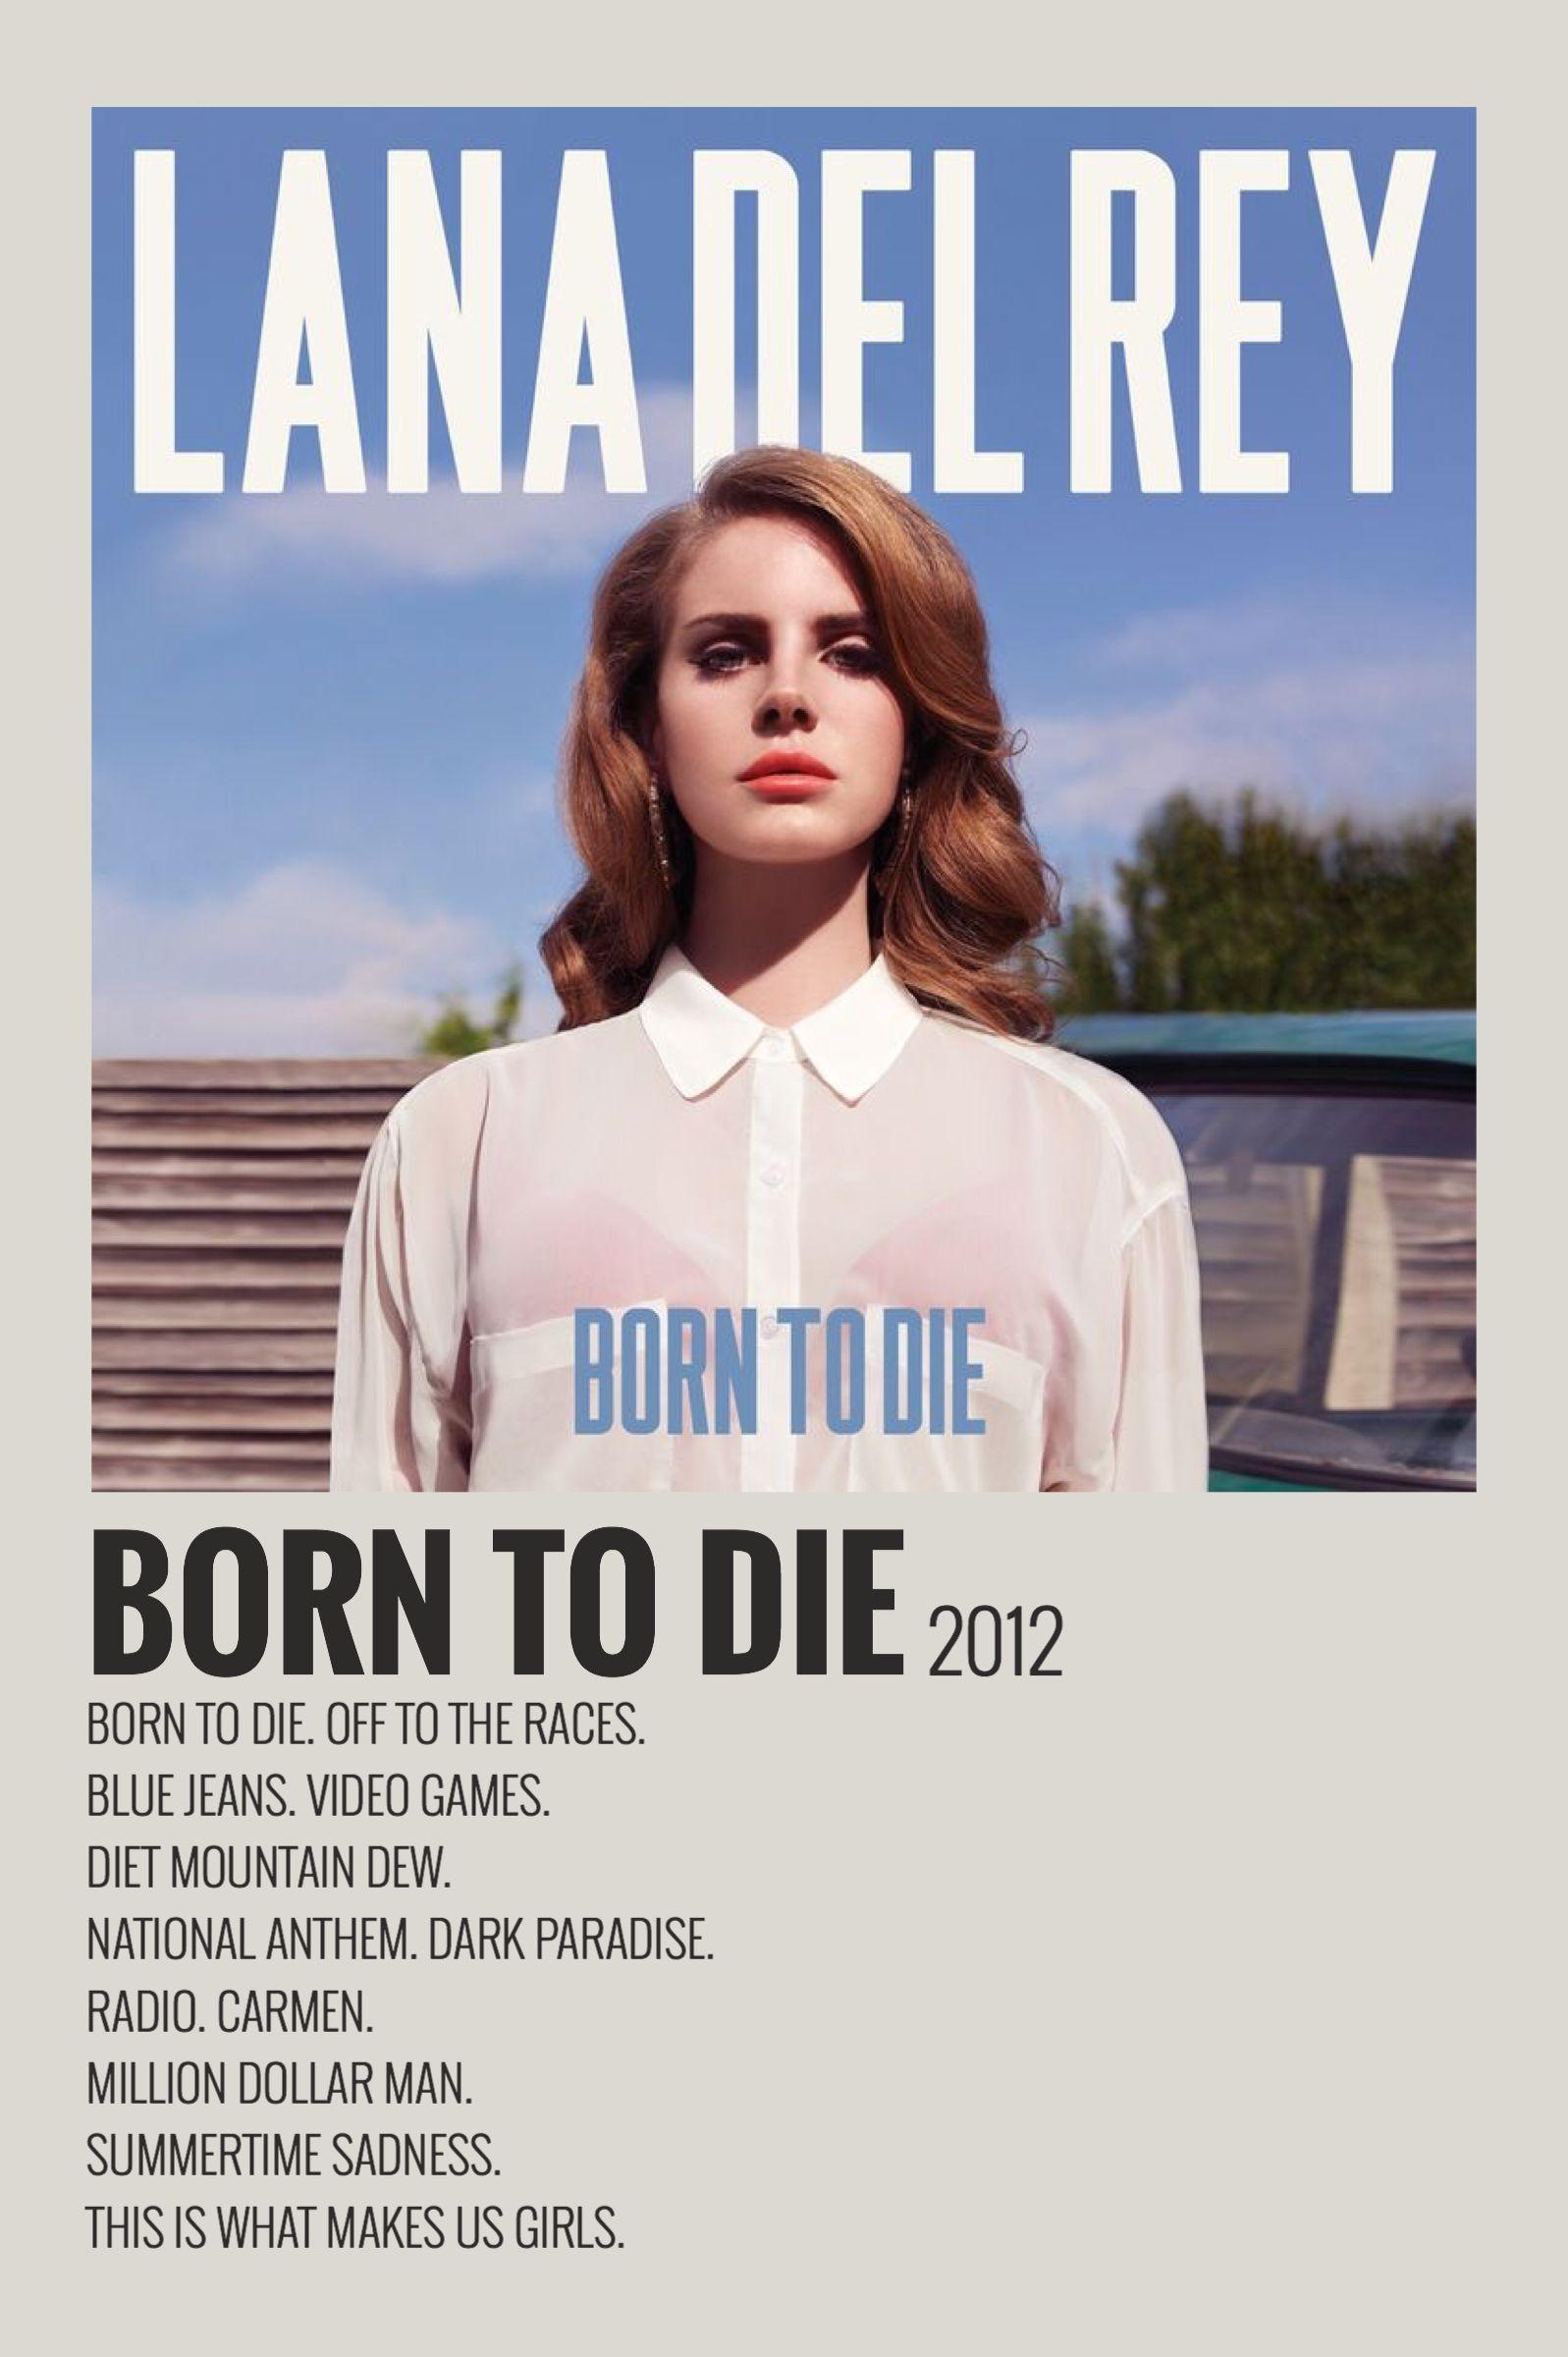 Alternative Minimalist Music Album Polaroid Poster Born To Die By Lana Del Rey 2012 In 2020 Movie Posters Minimalist Film Posters Minimalist Vintage Music Posters